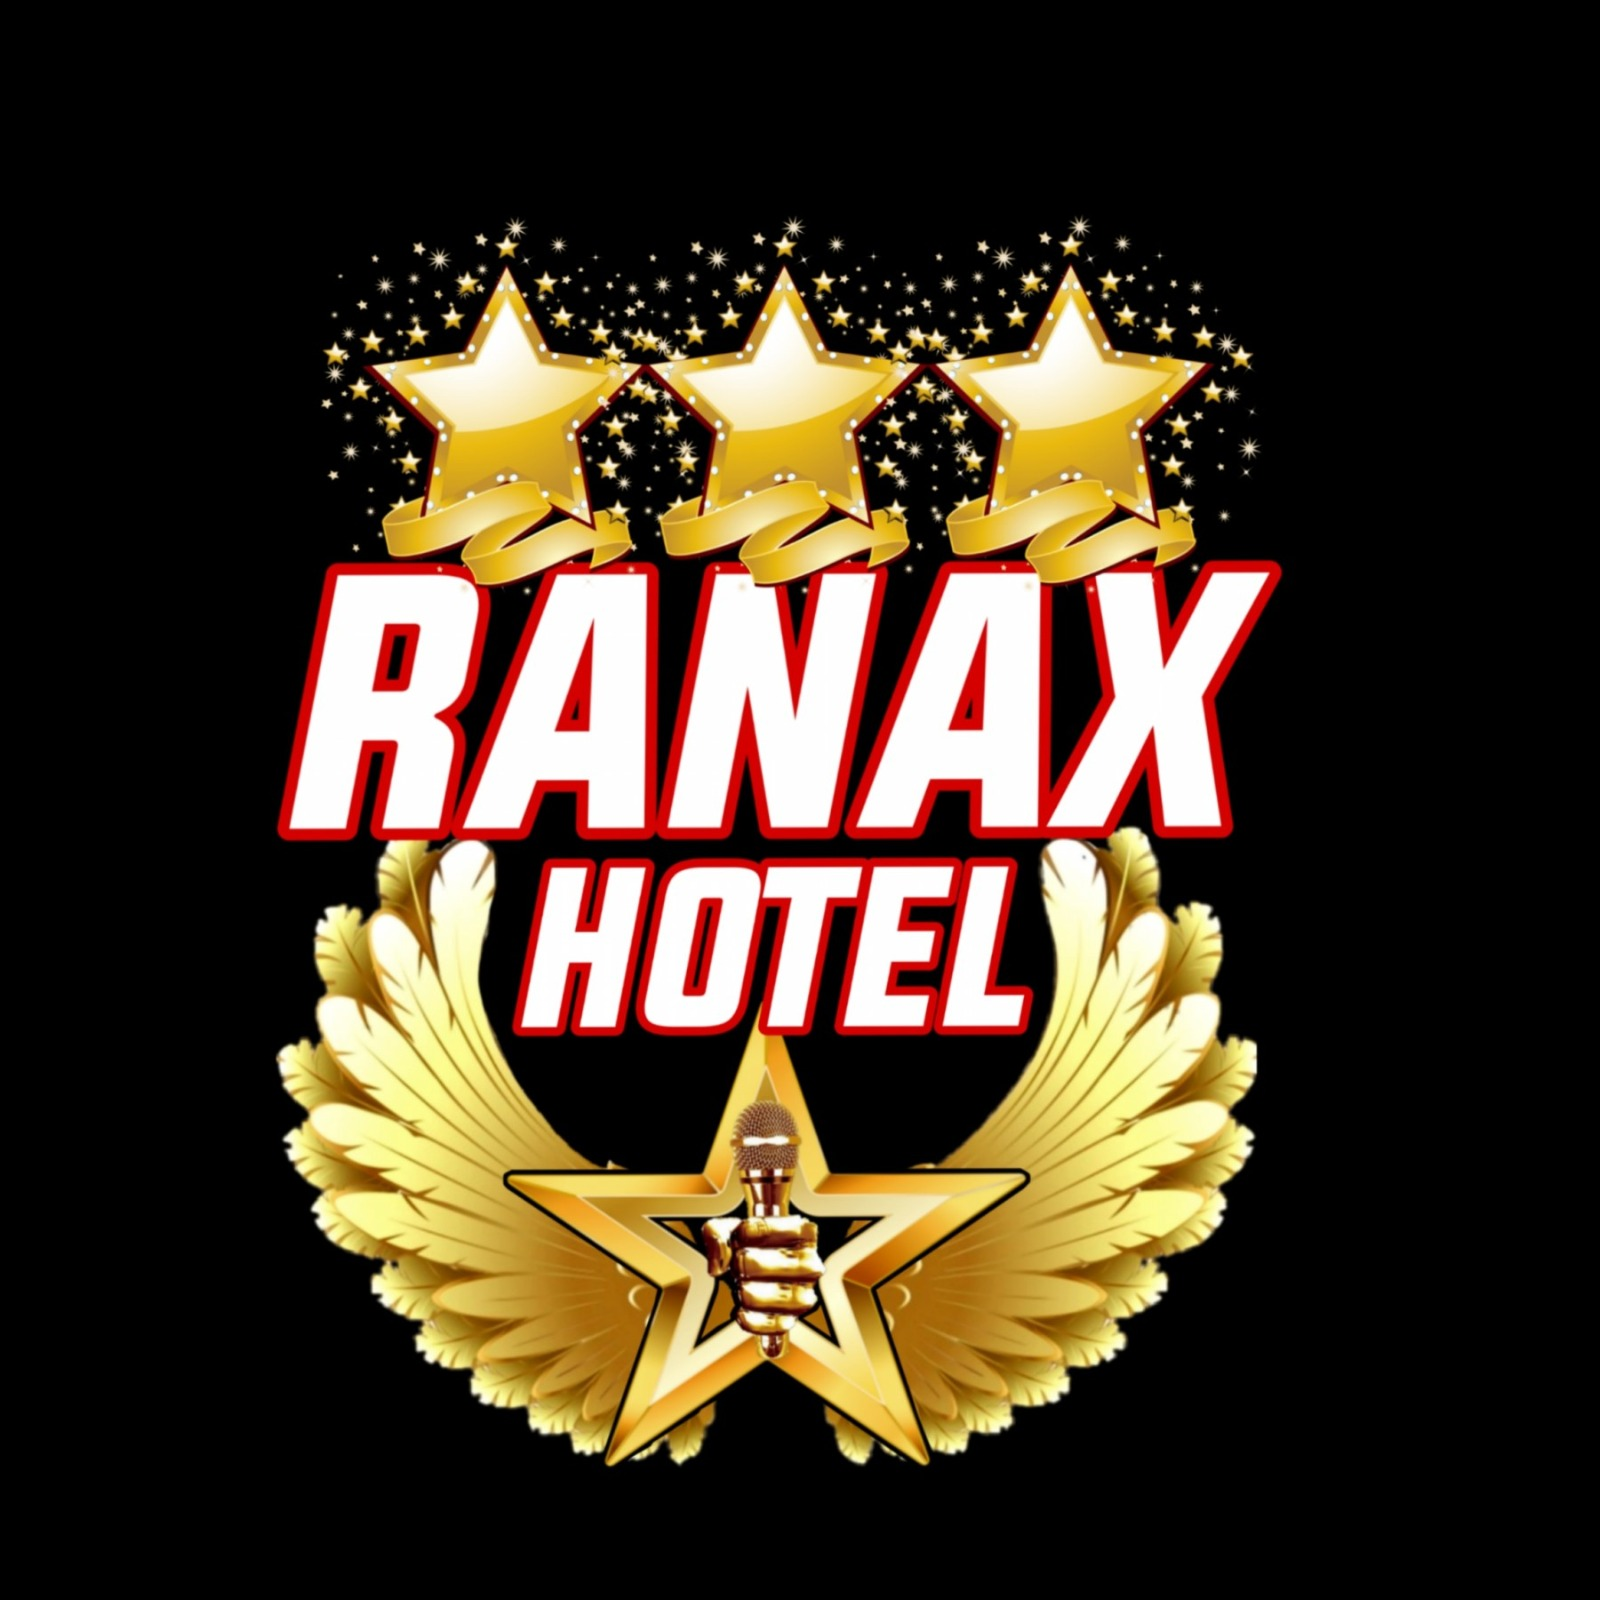 RANAX HOTEL KUMBURGAZ & GÜNEY SAHİL'LERİ İSTANBUL'DA